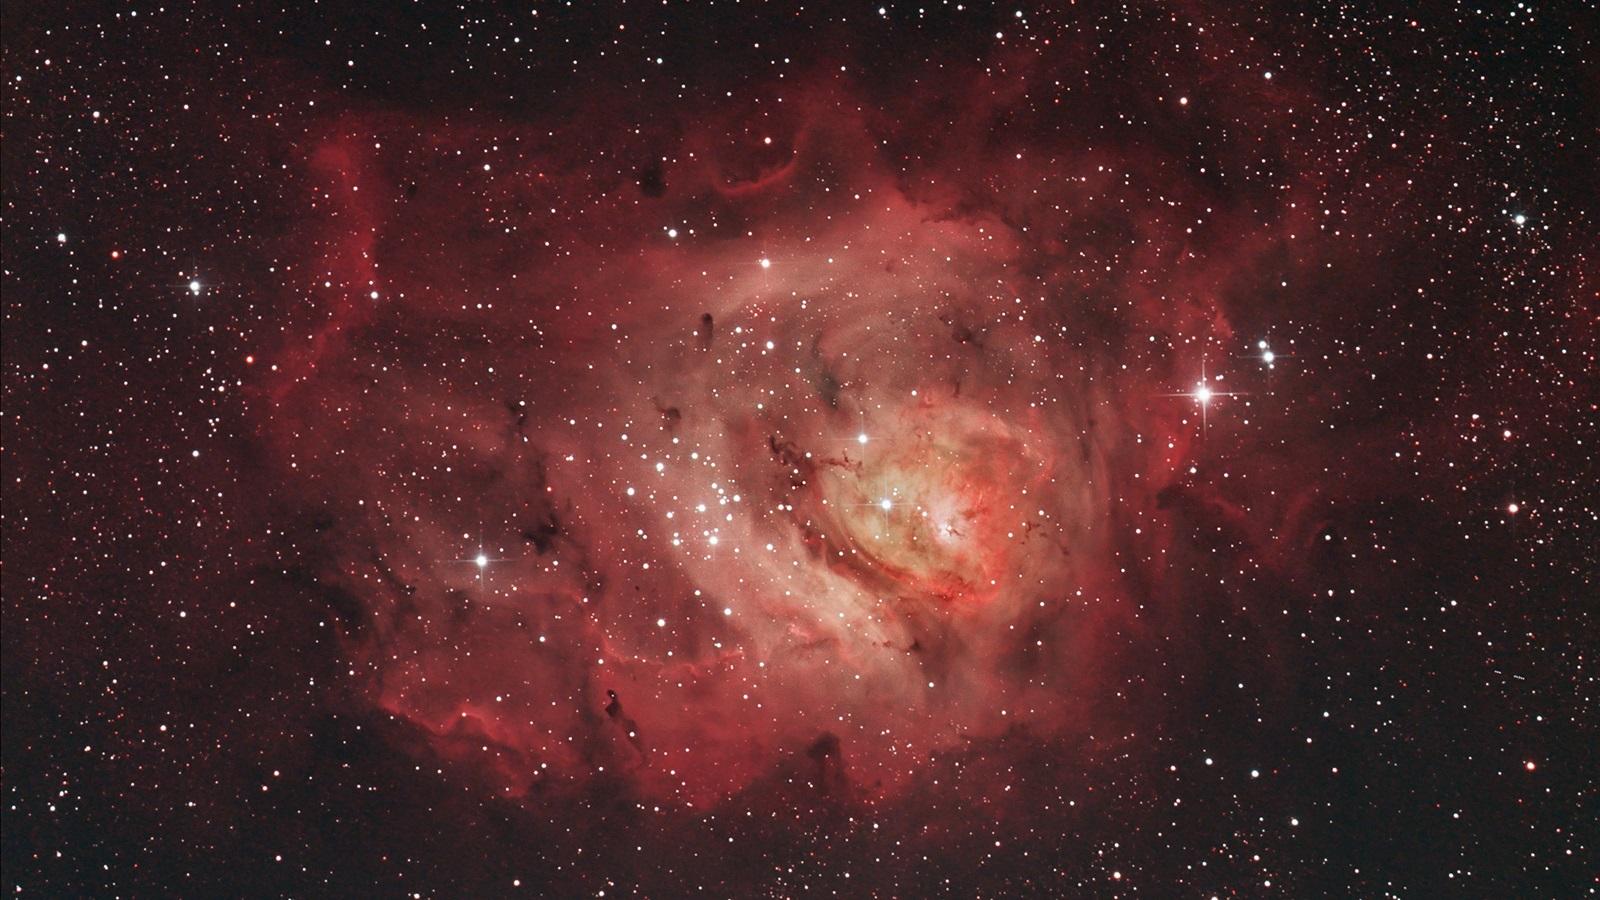 Download wallpaper 1600x900 interstellar cloud nebula - Space wallpaper 1600x900 ...